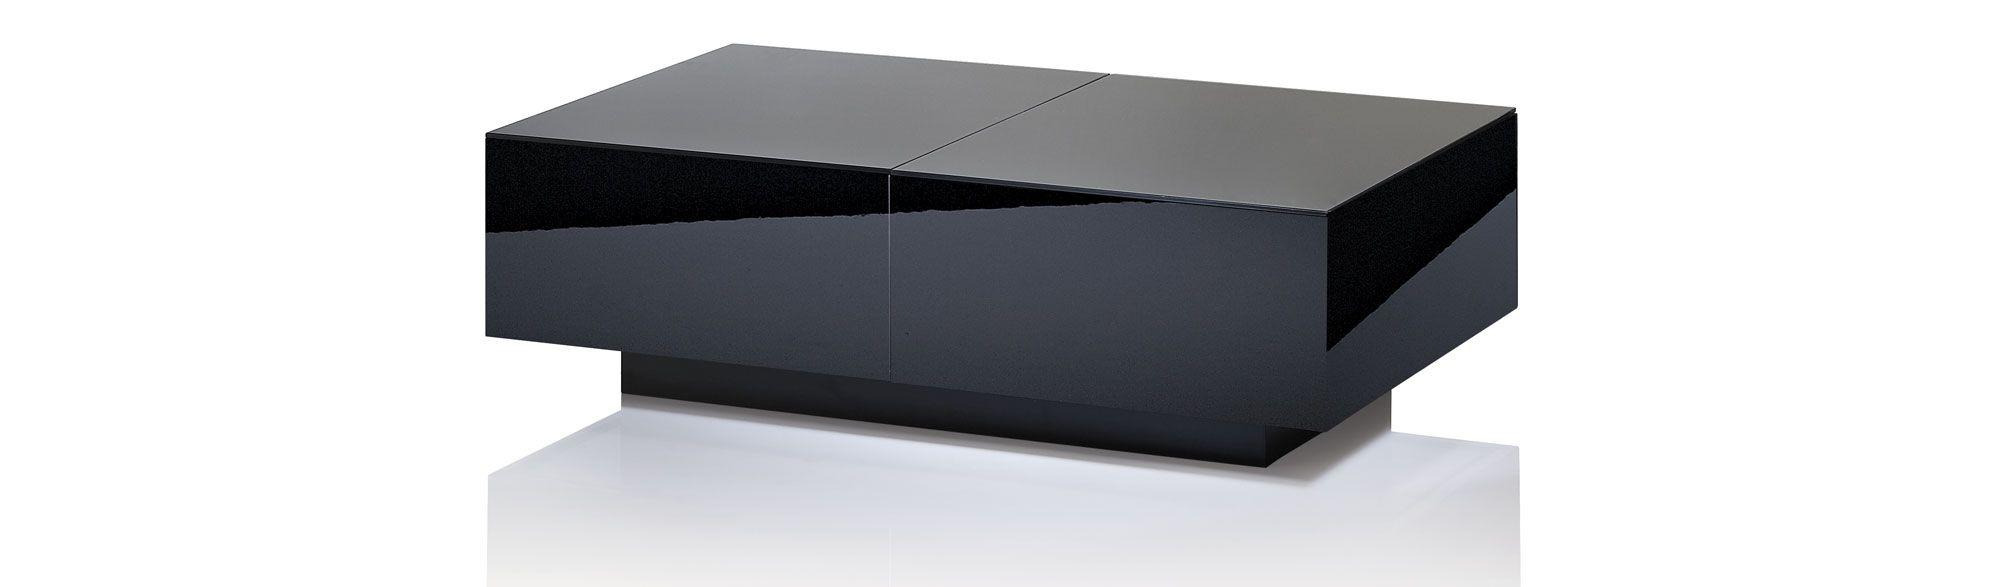 Extending Table 187 Black Extending Tables : 259 8842PI1000190MNwid2000amphei2000 from extendingtable.co.uk size 2000 x 2000 jpeg 56kB